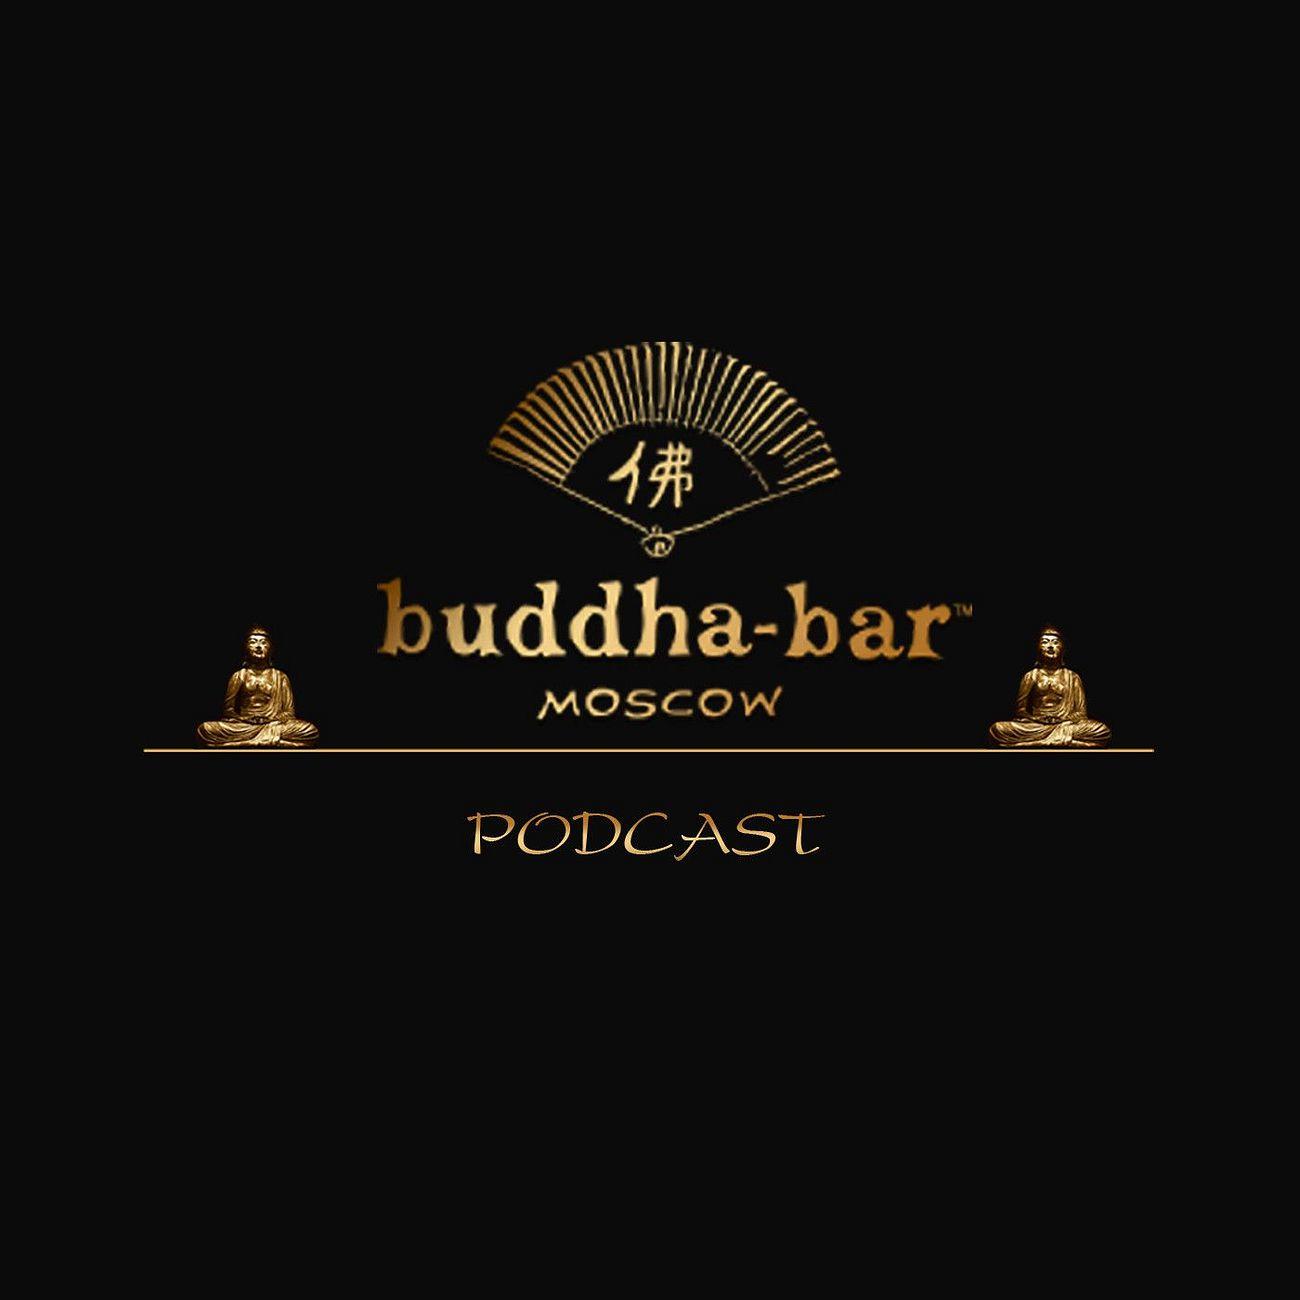 Buddha bar Moscow